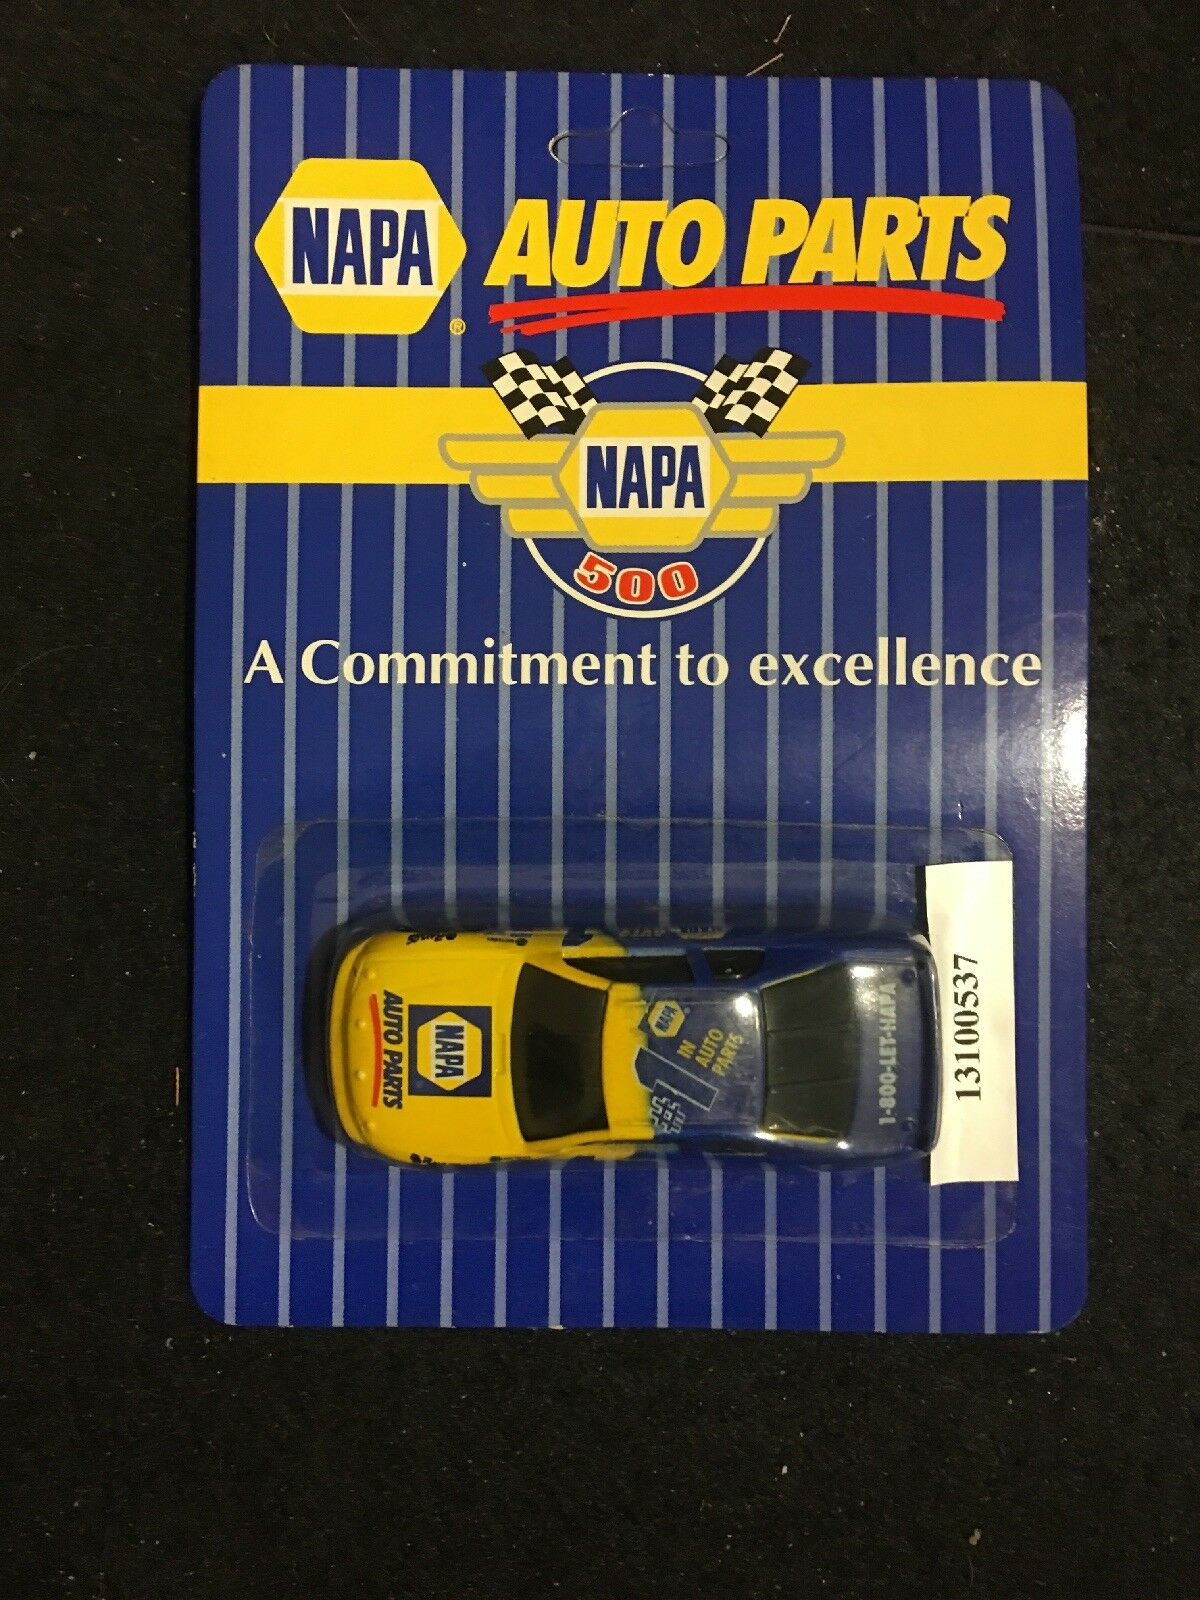 RACING CHAMPIONS 1995 NASCAR NAPA 500 CHEVY MONTE CARLO 1 64 DIECAST RARE